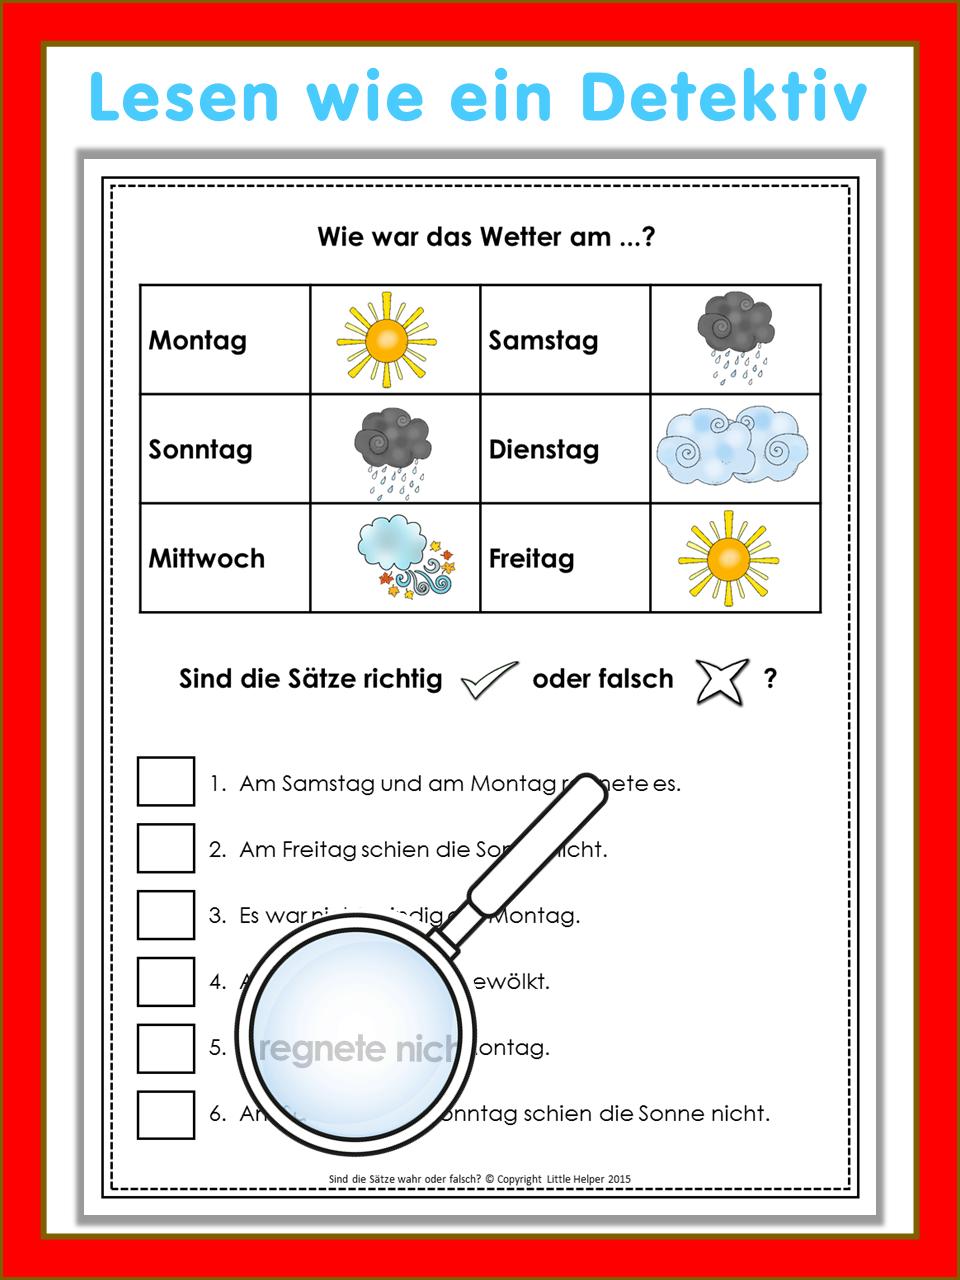 german reading challenge richtig oder falsch 24 leser tsel my teaching resources german. Black Bedroom Furniture Sets. Home Design Ideas